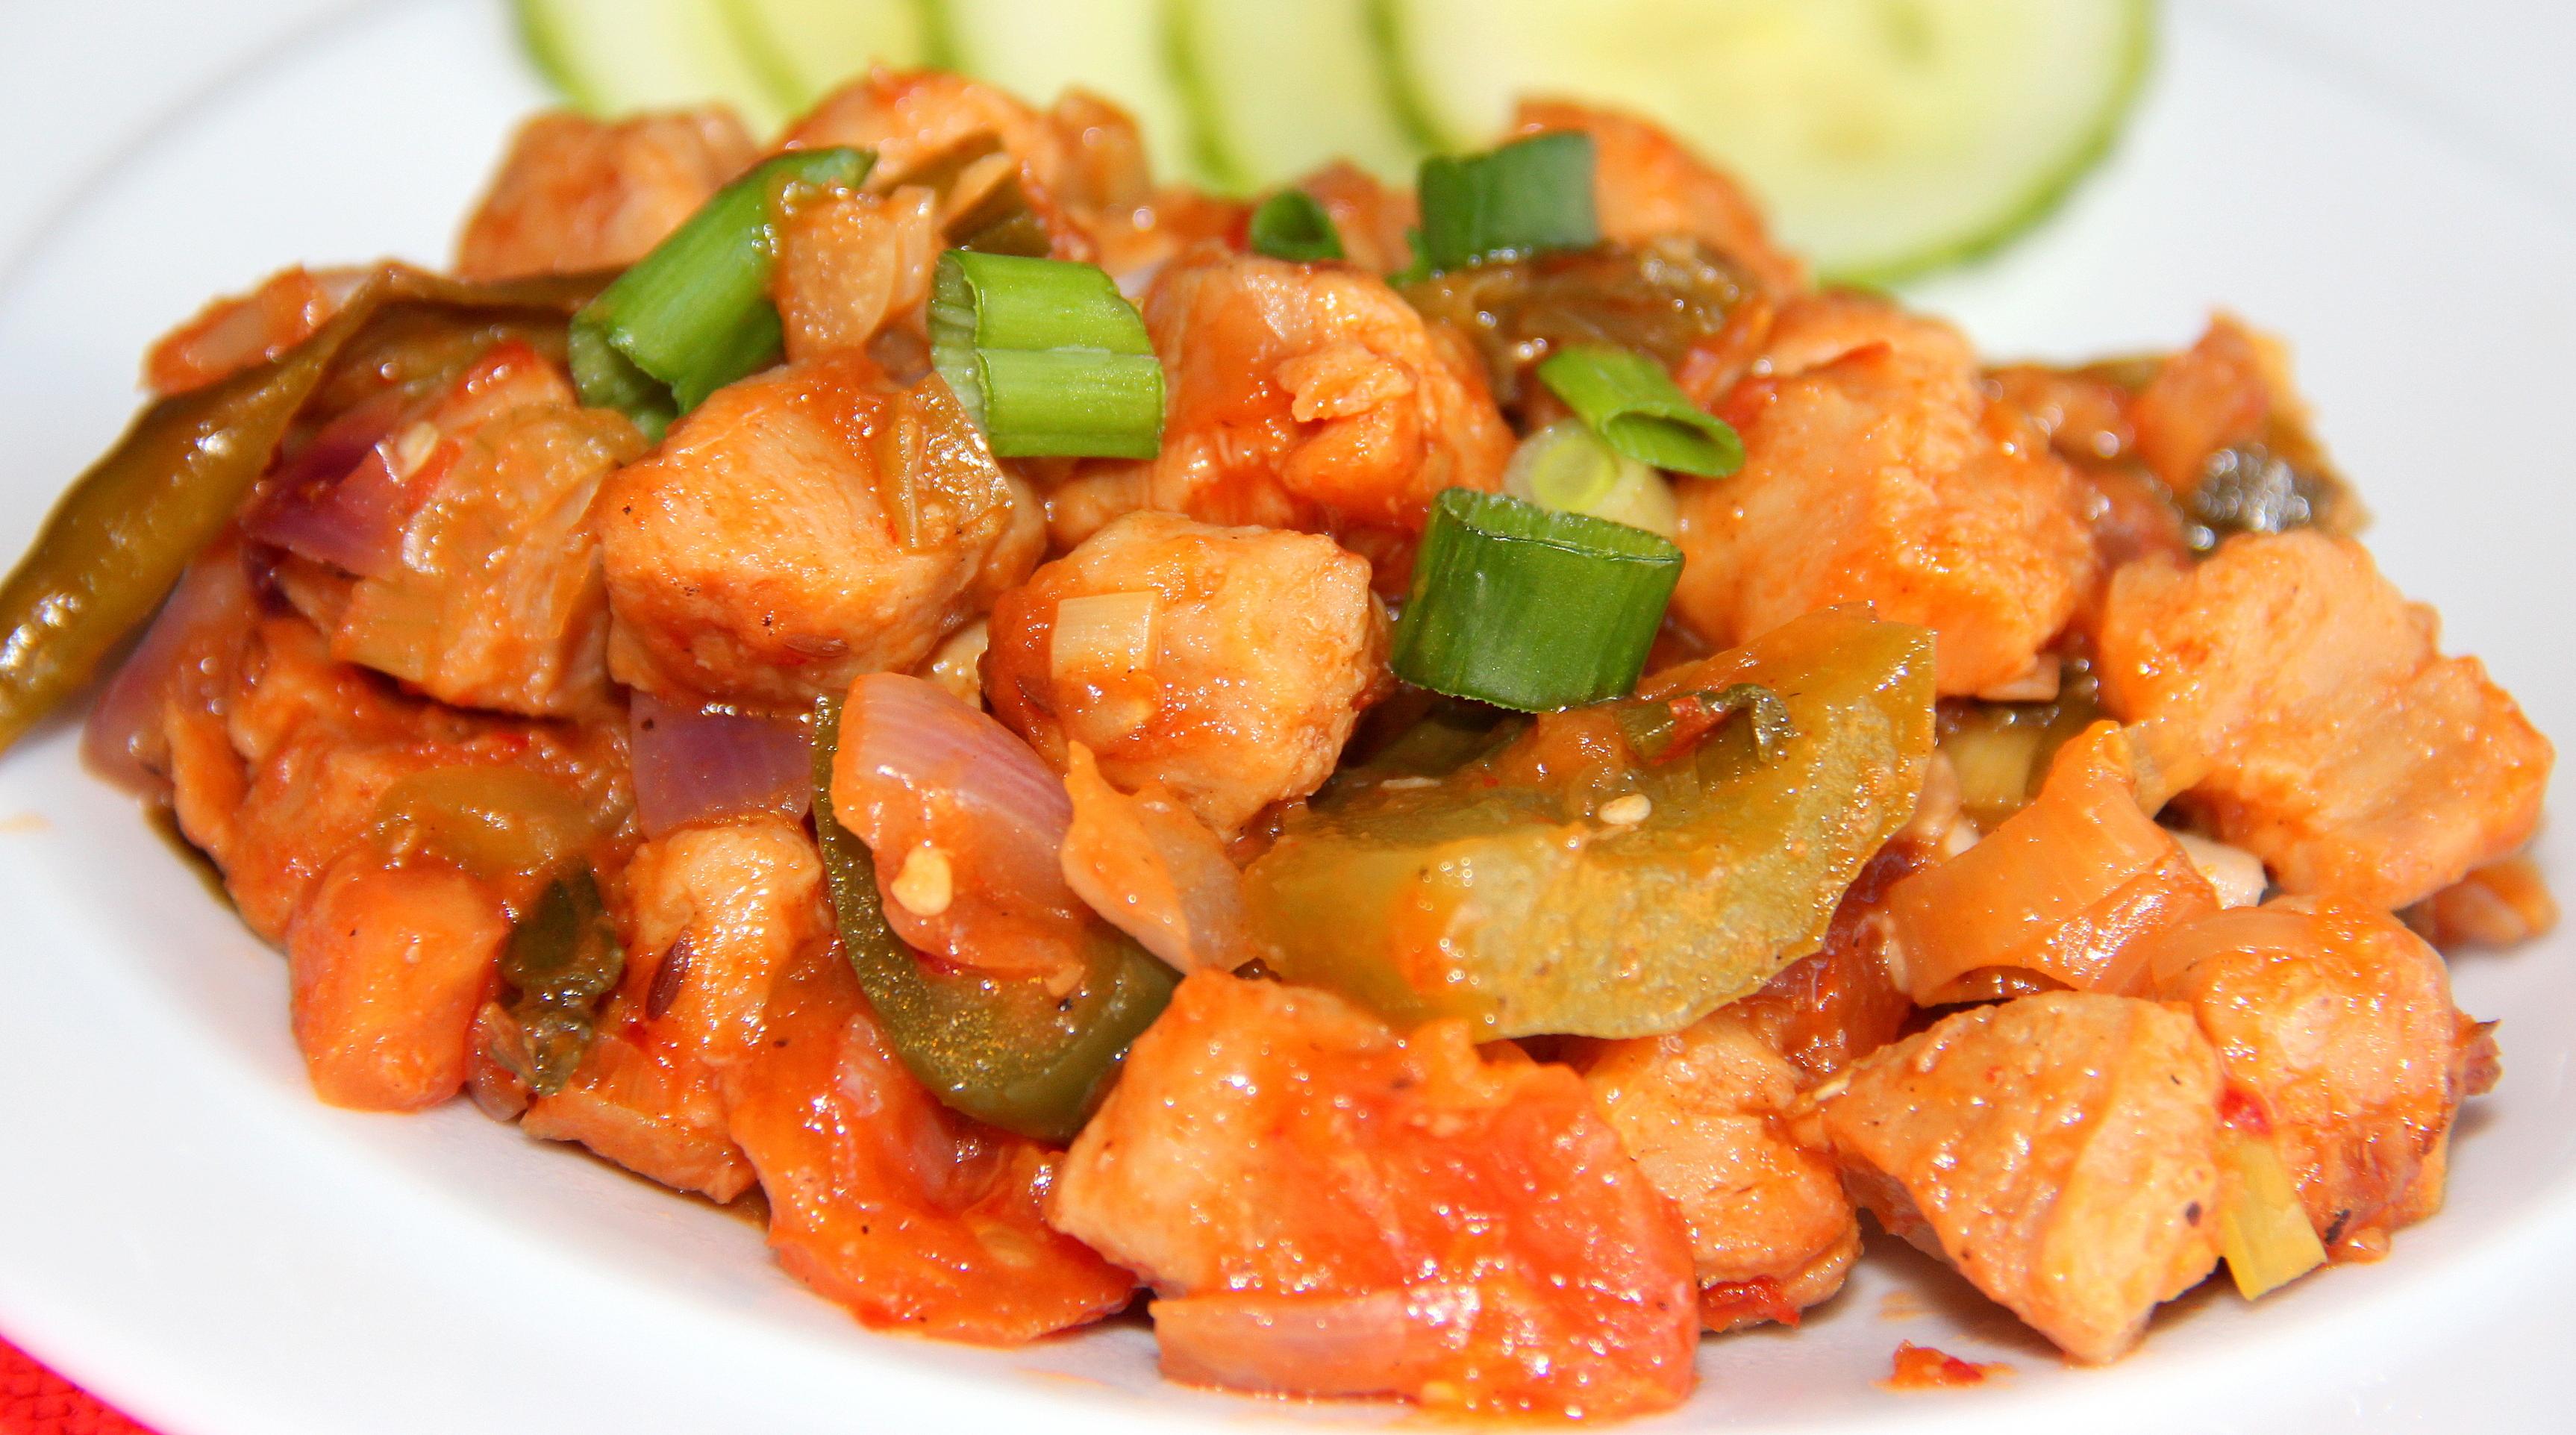 Spicy Kadai soya – Vegan: (Indo-Chinese Cuisine)